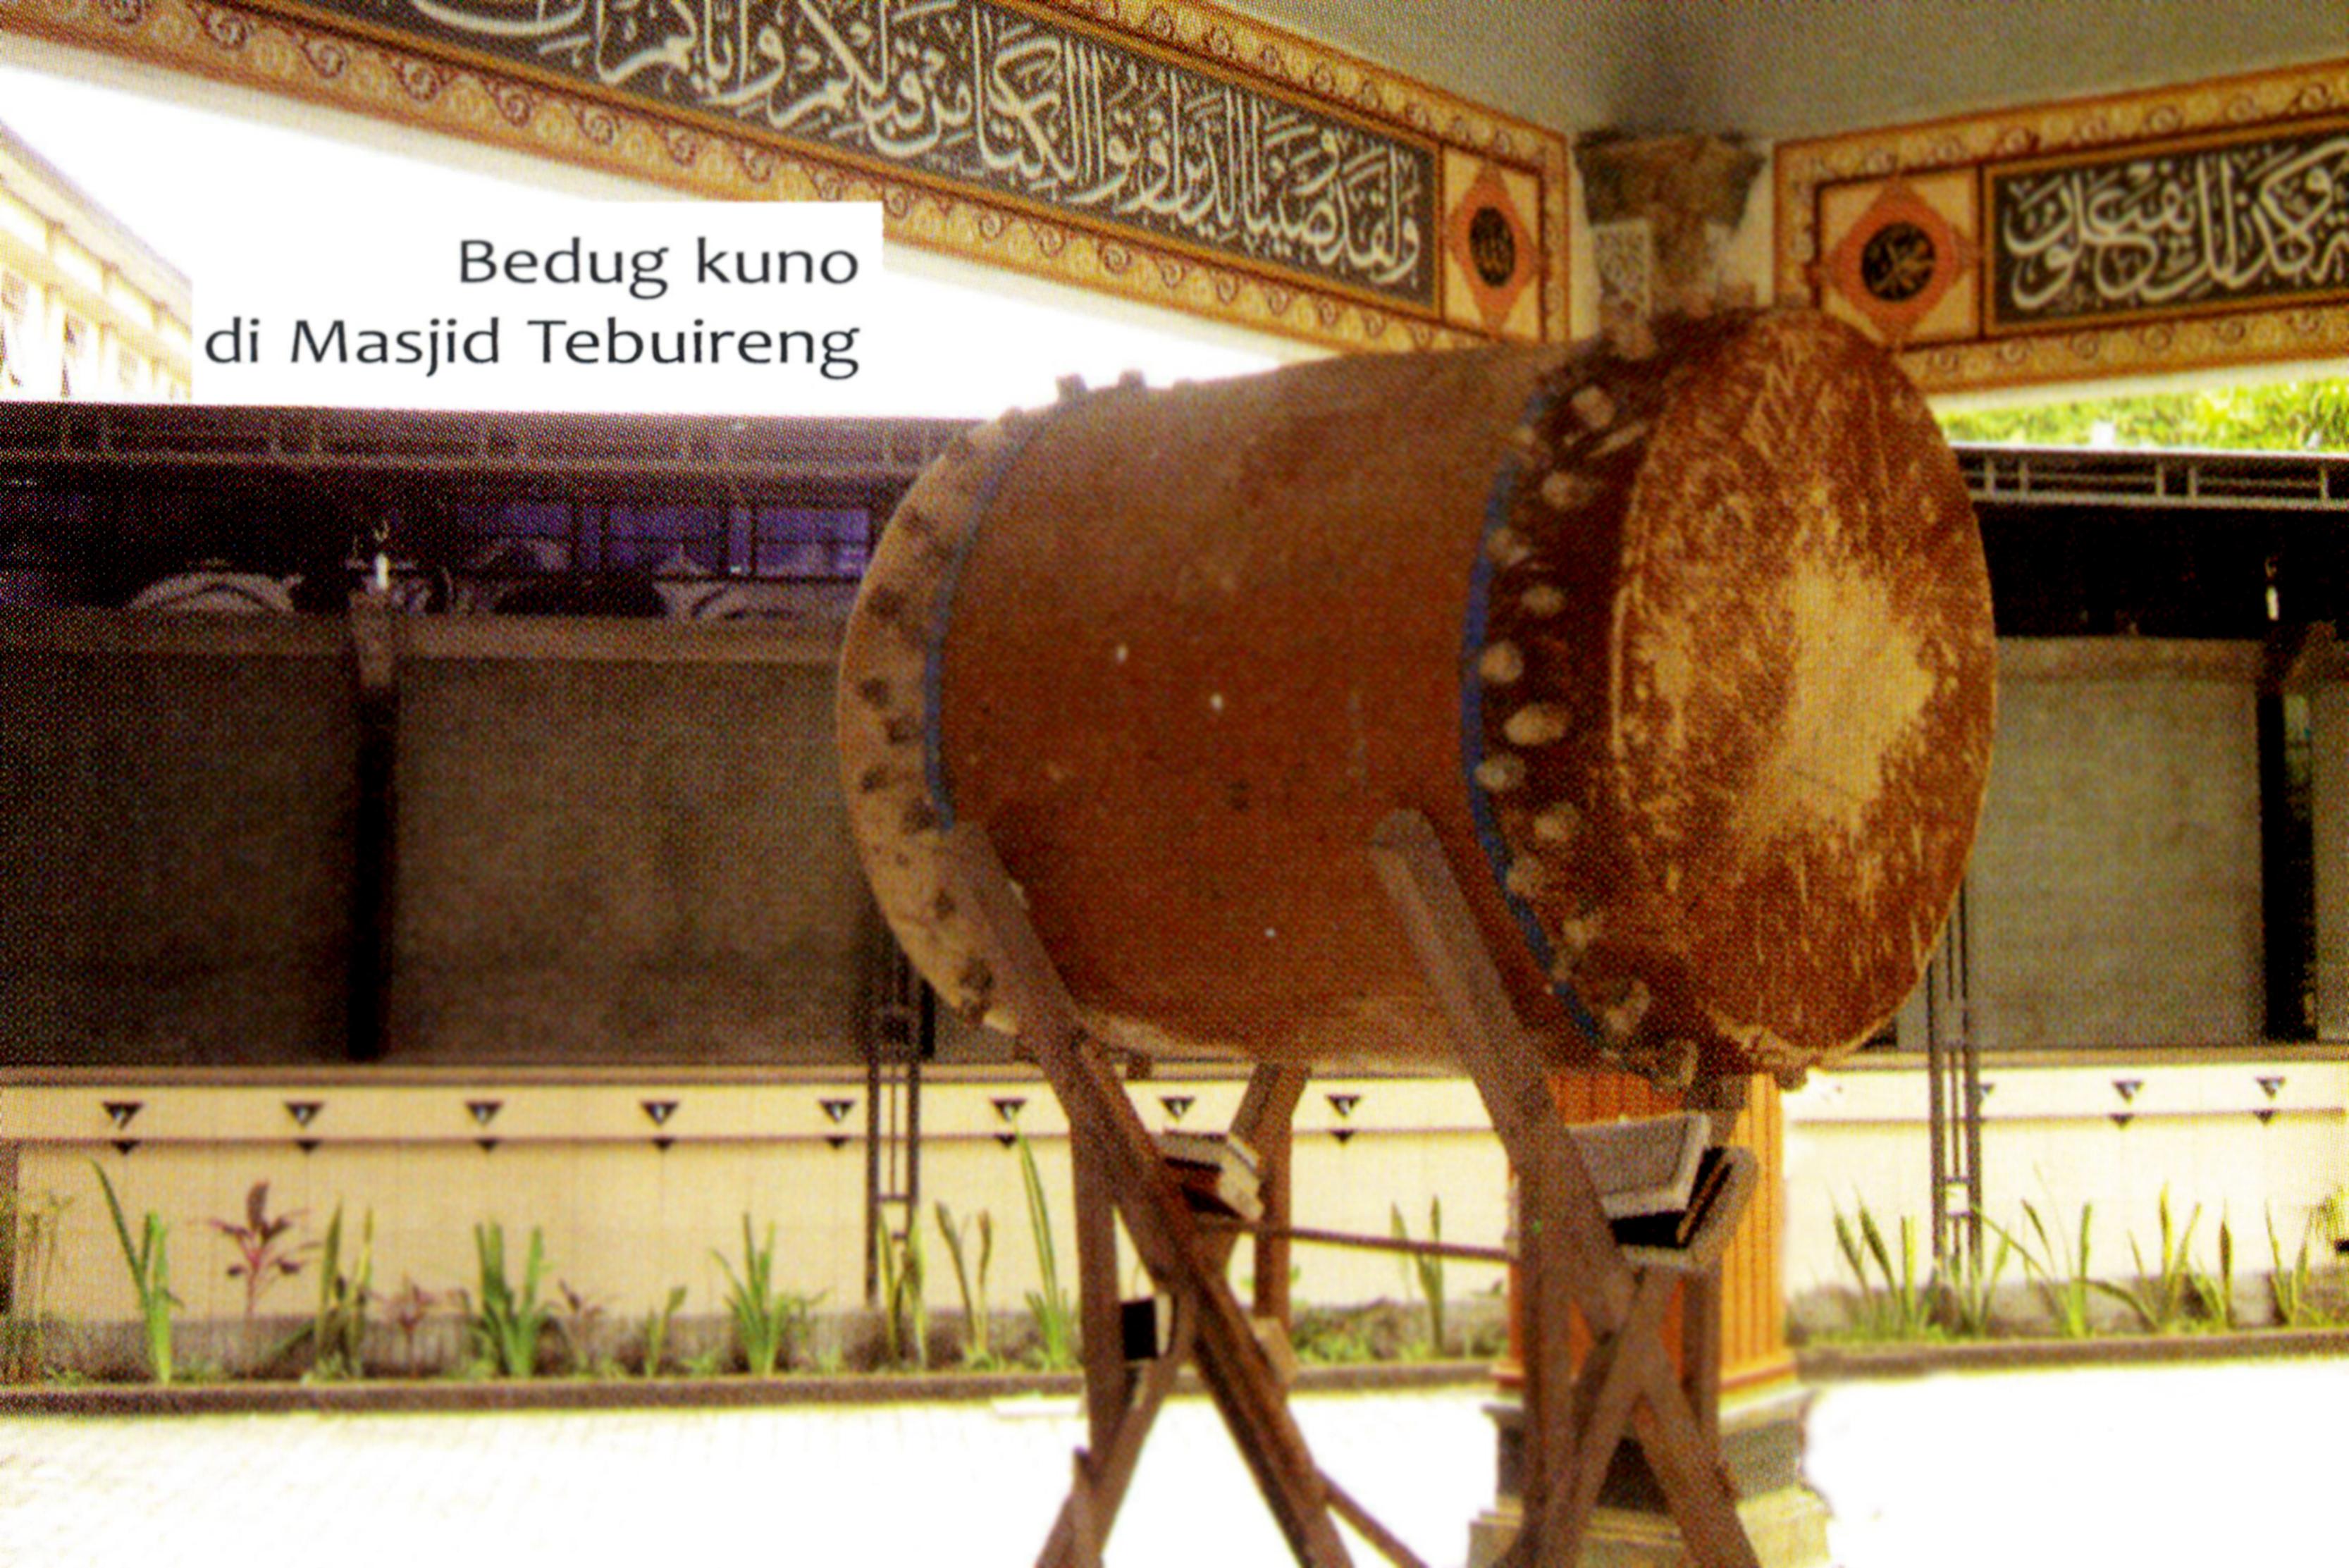 Yayasan Hasyim Asyari Tebuireng Pusaka Jawatimuran Kue Bakpia By Kuliner Yulis Saekowati Akumandiri 3